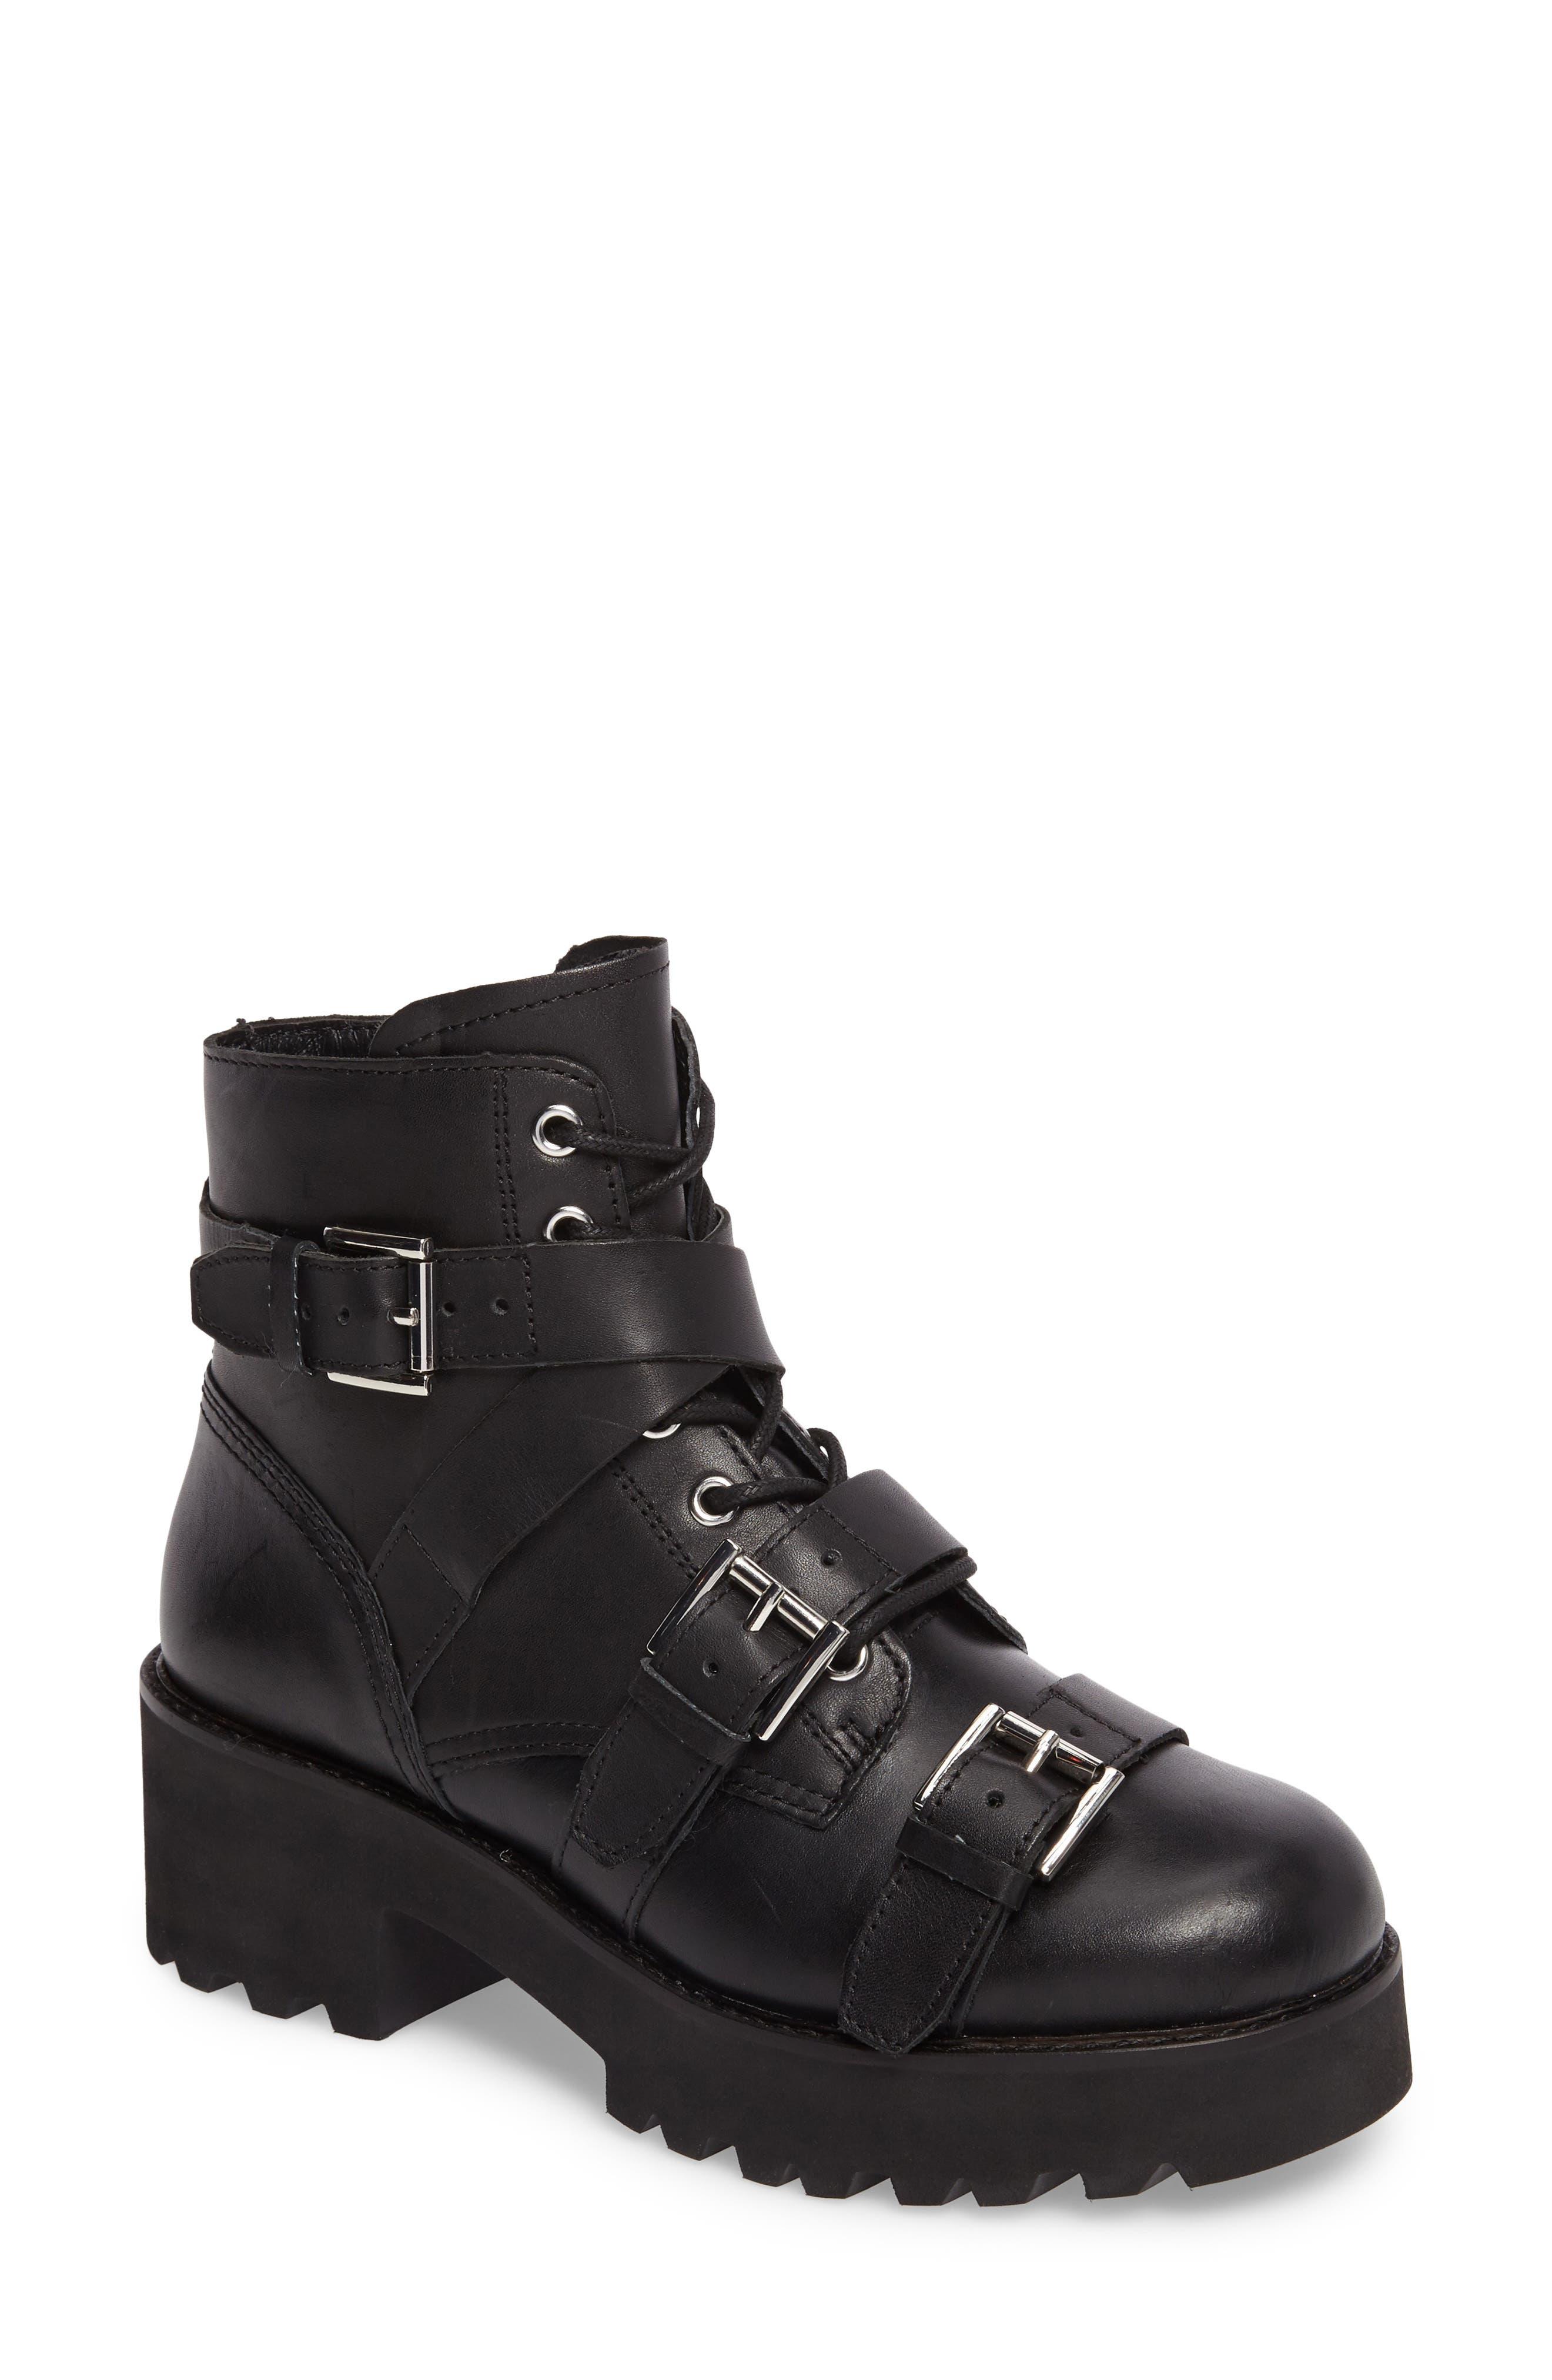 Razor Bootie,                         Main,                         color, Black Leather